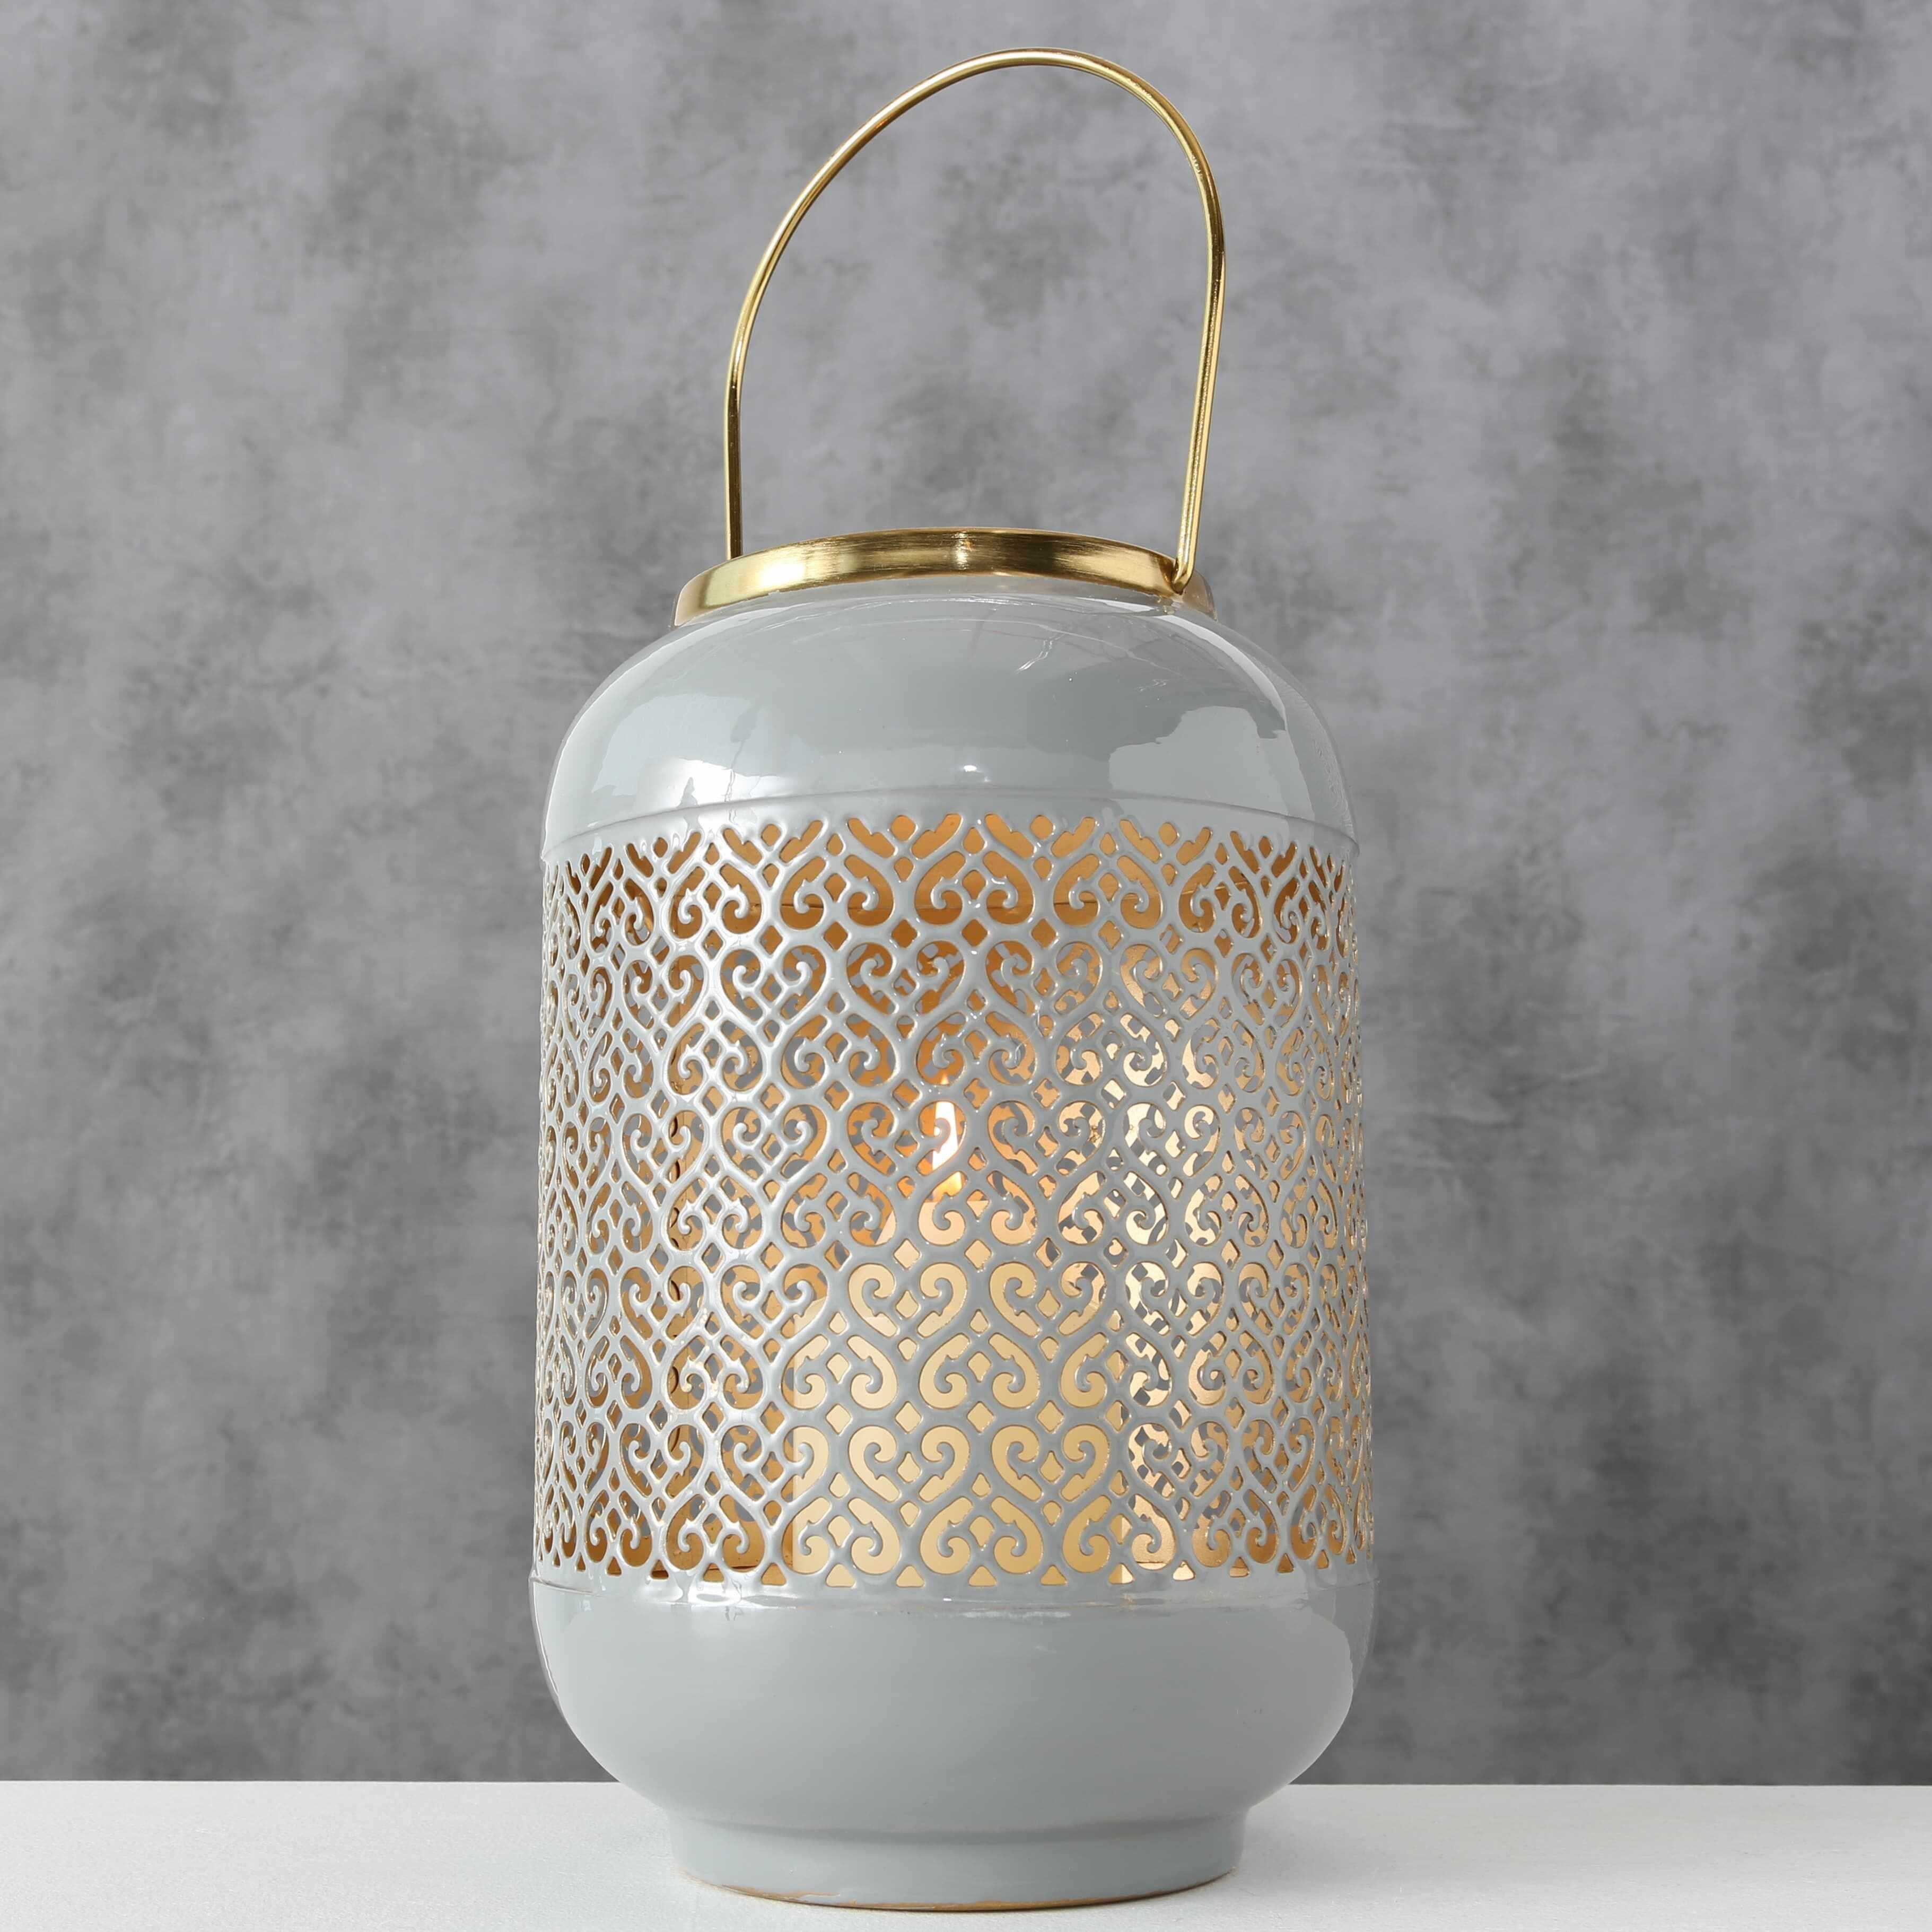 Felinar decorativ din metal Astair Gri / Auriu, Ø18xH27 cm la pret 165 lei